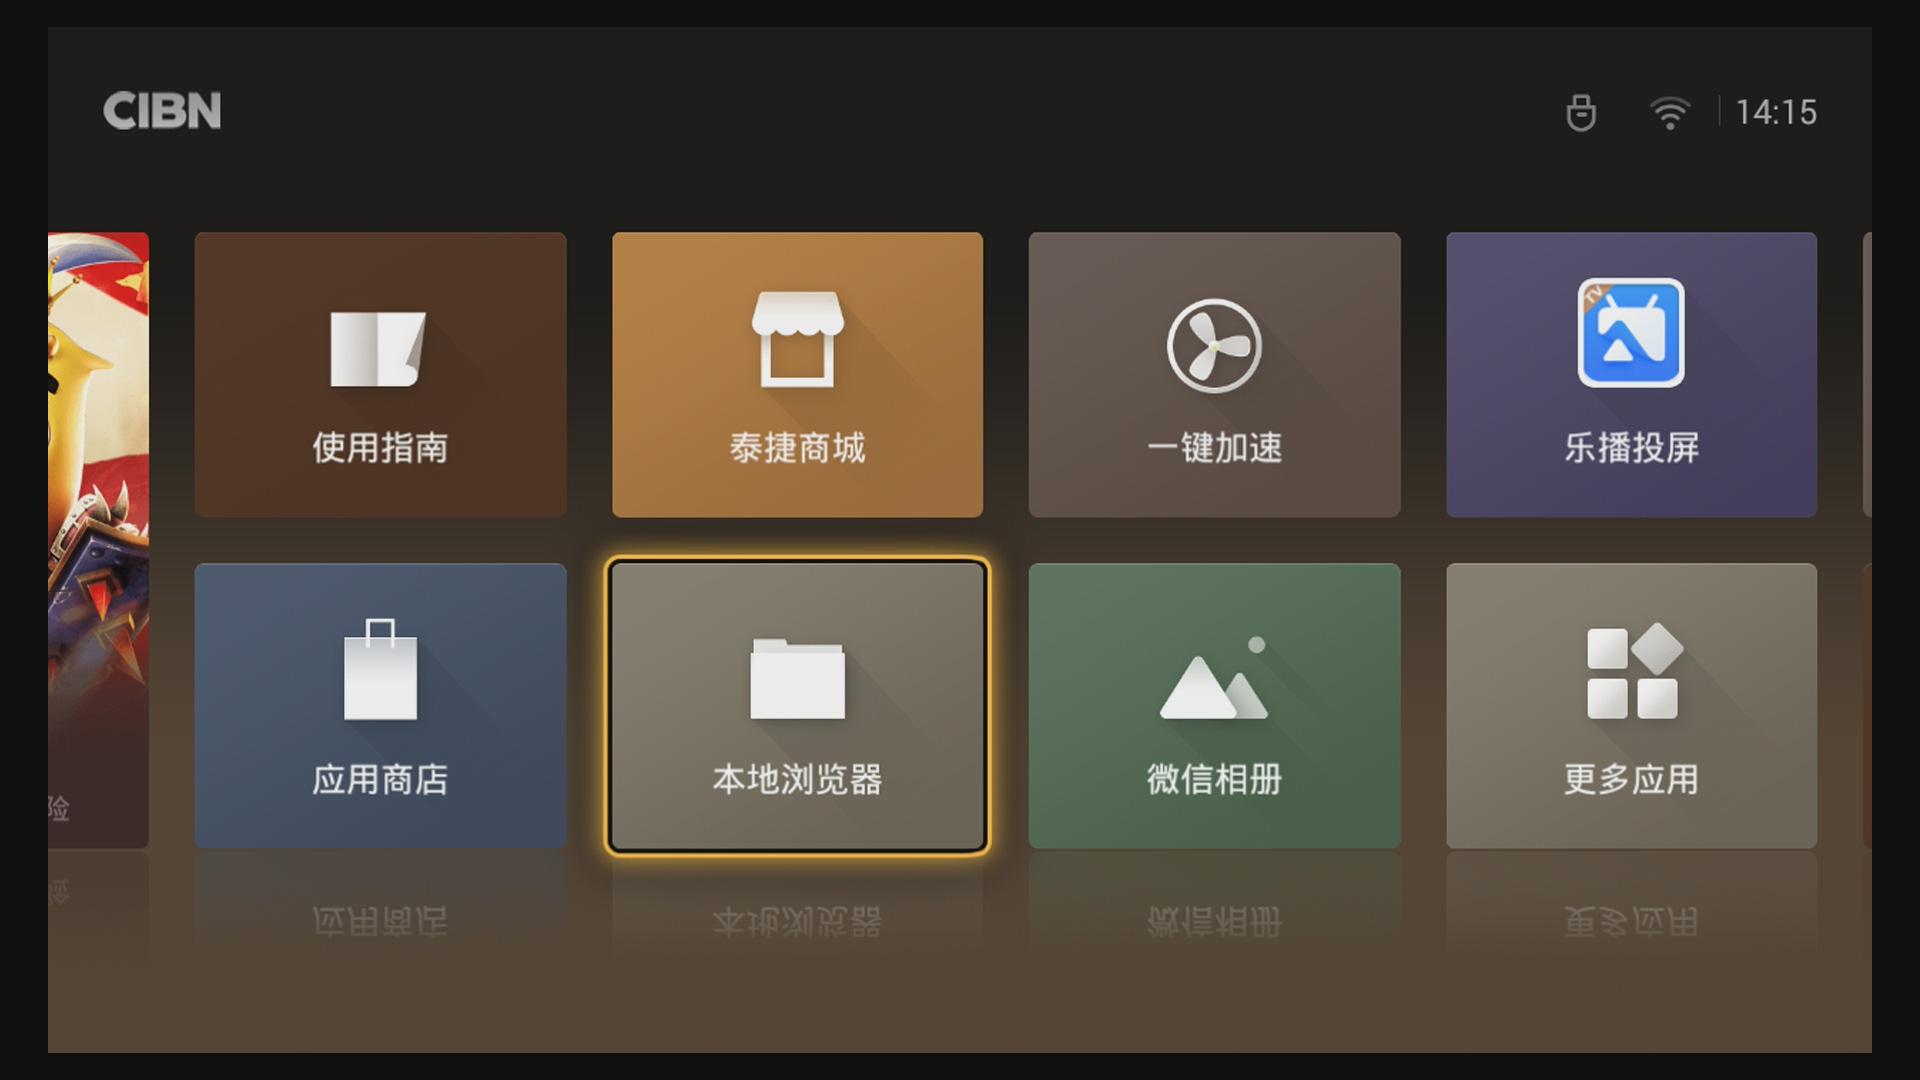 WEBOX京东定制版通过U盘安装沙发管家教程